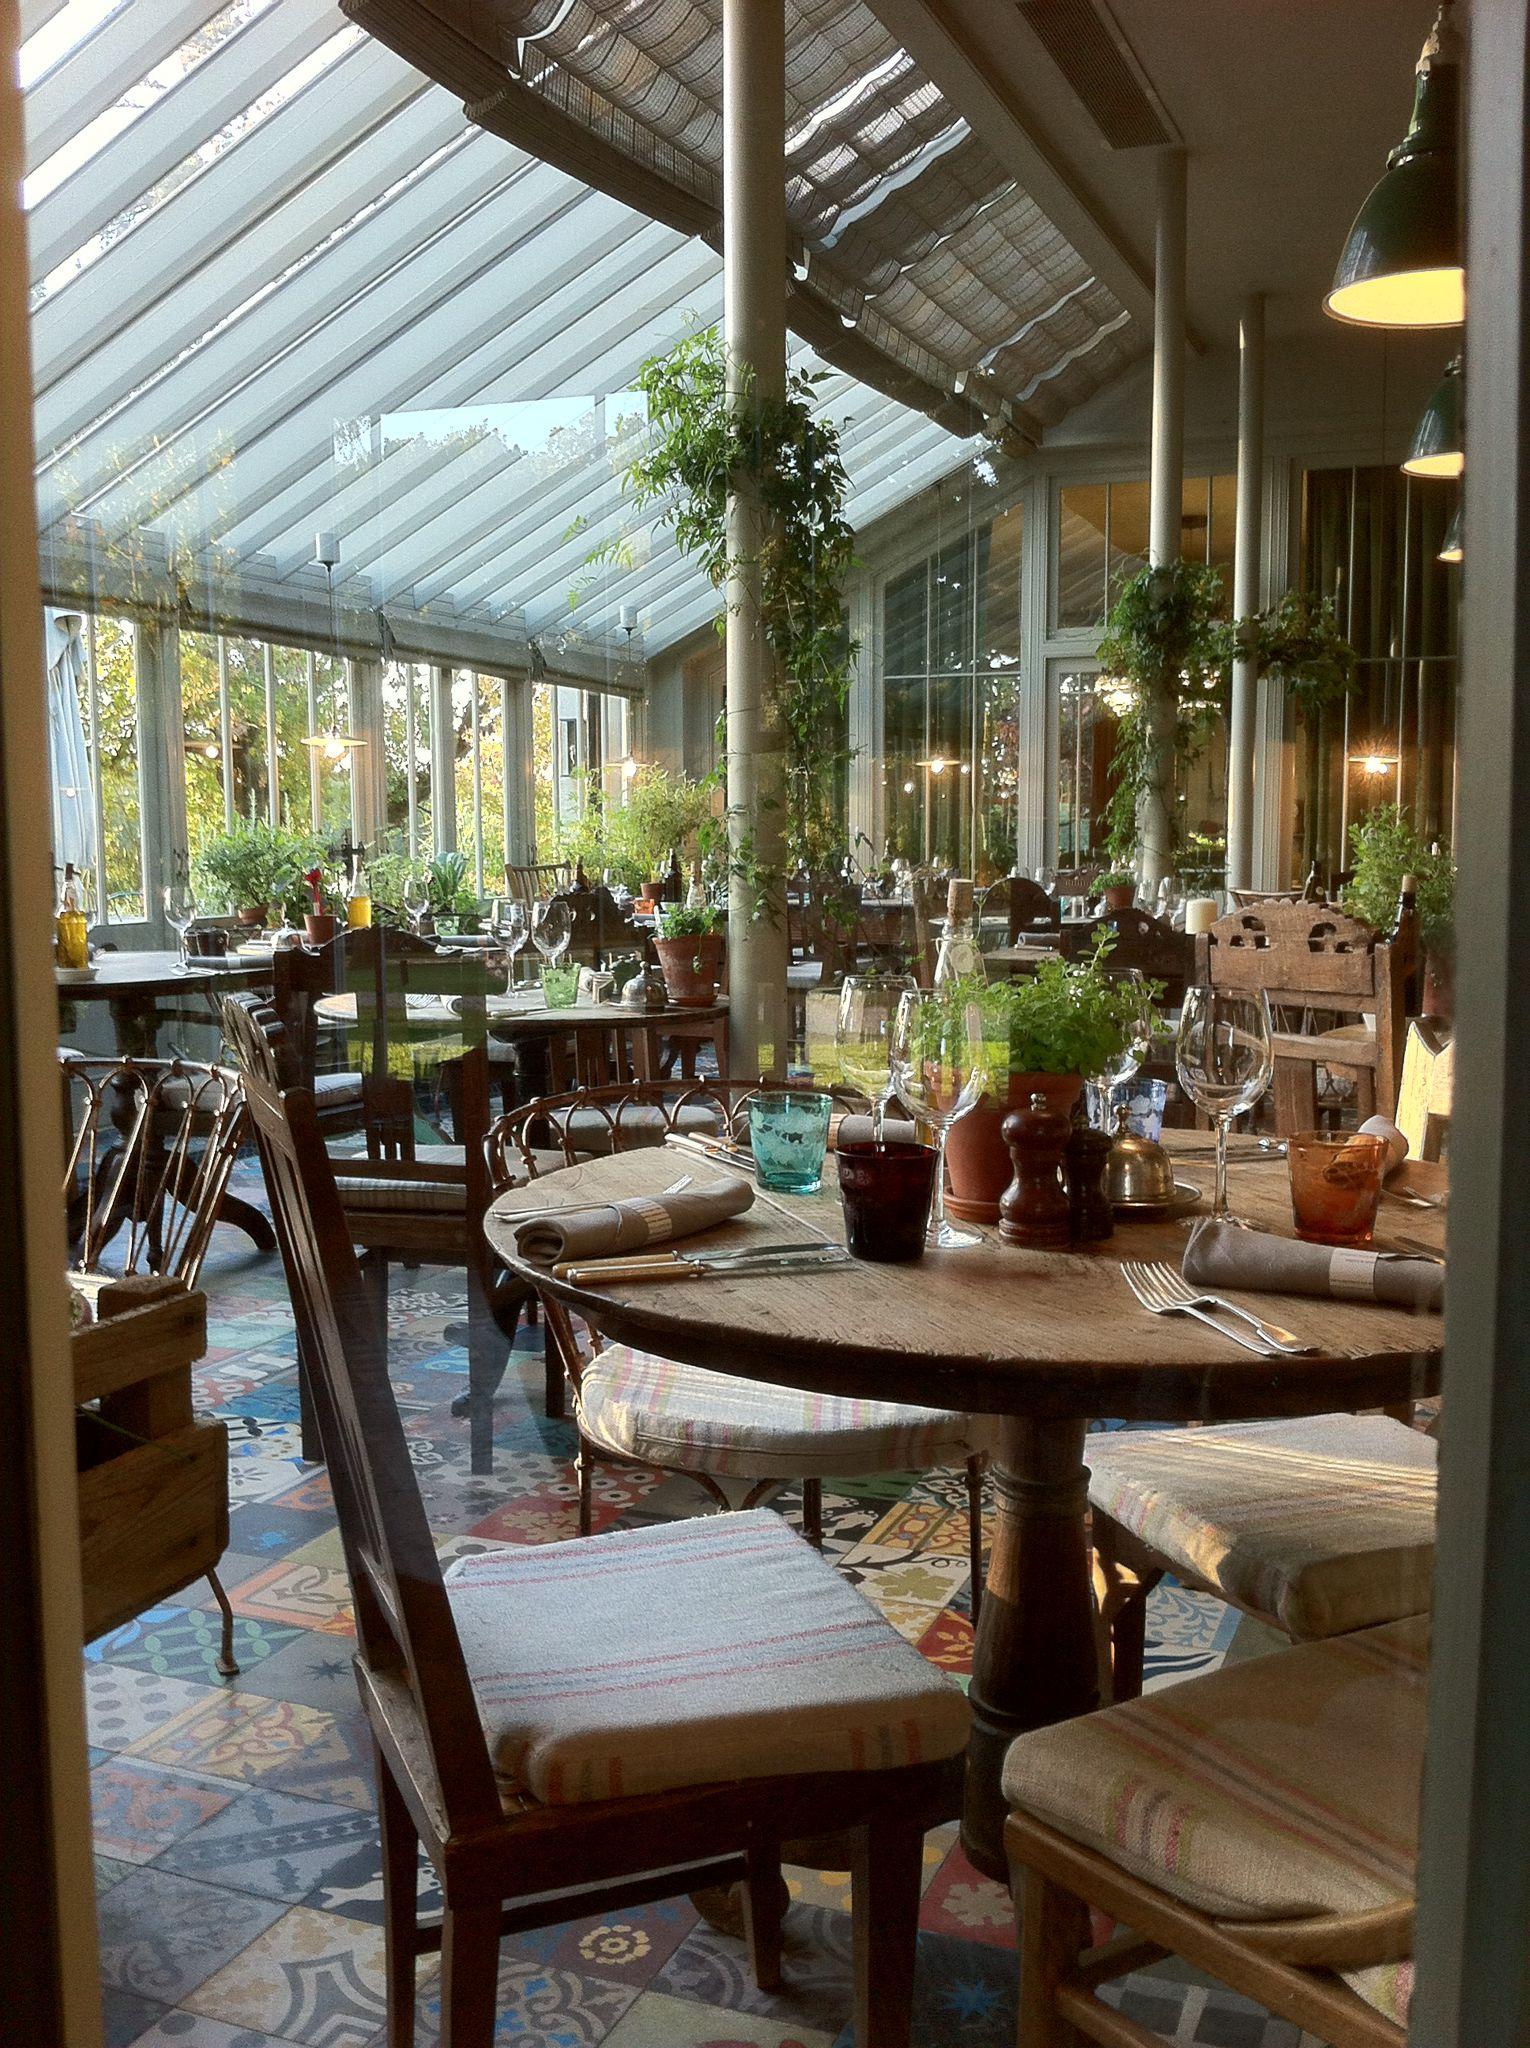 beautiful restaurant in the summer or winter wonderful light